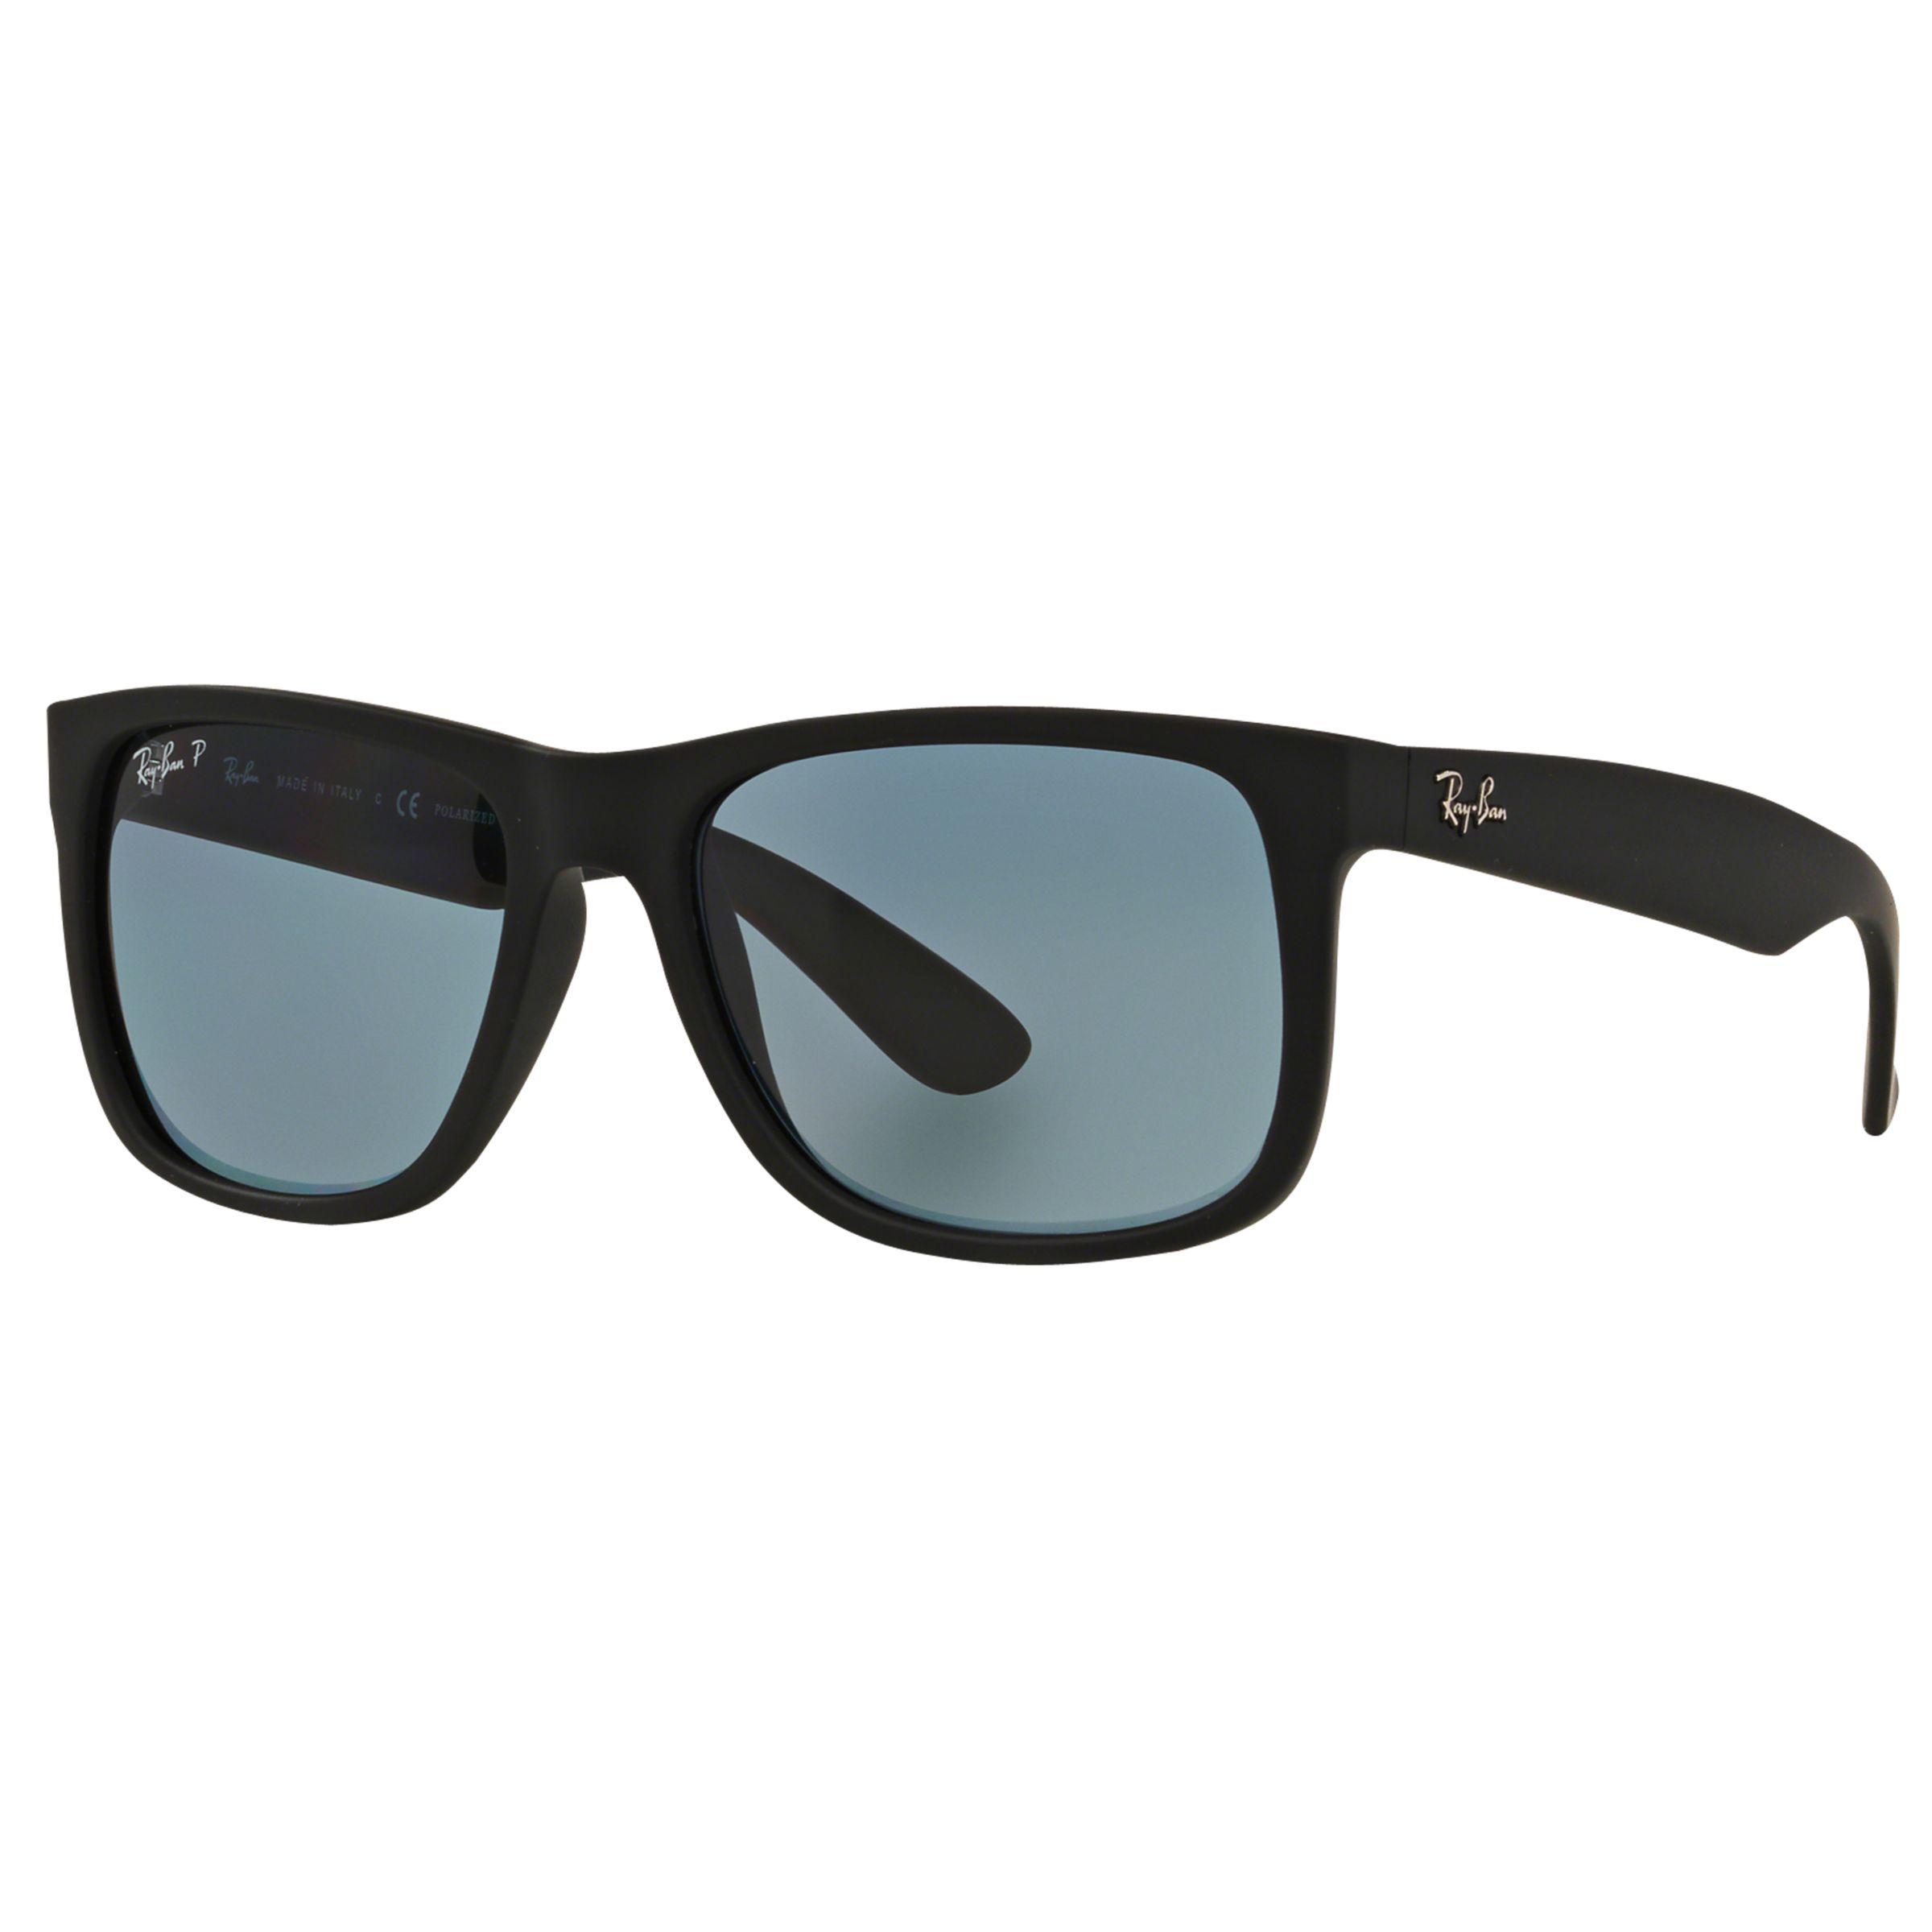 Ray-ban Ray-Ban RB4165 Justin Polarised Wayfarer Sunglasses